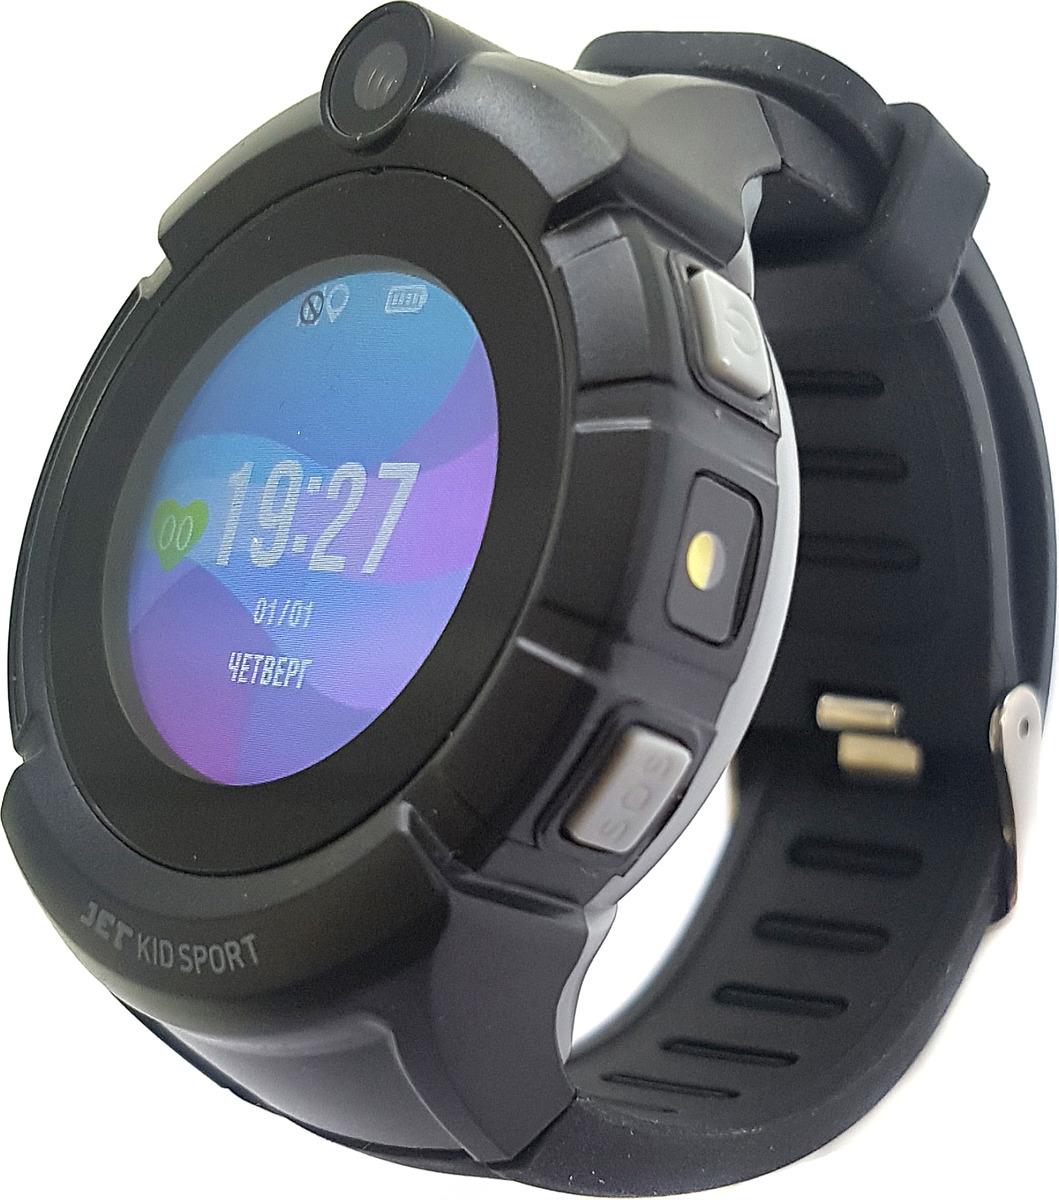 Смарт-браслет для детей Jet Kid Sport, черный e6 cmos 2 0mp gps locator anti lost alarm device for the aged kid pet black